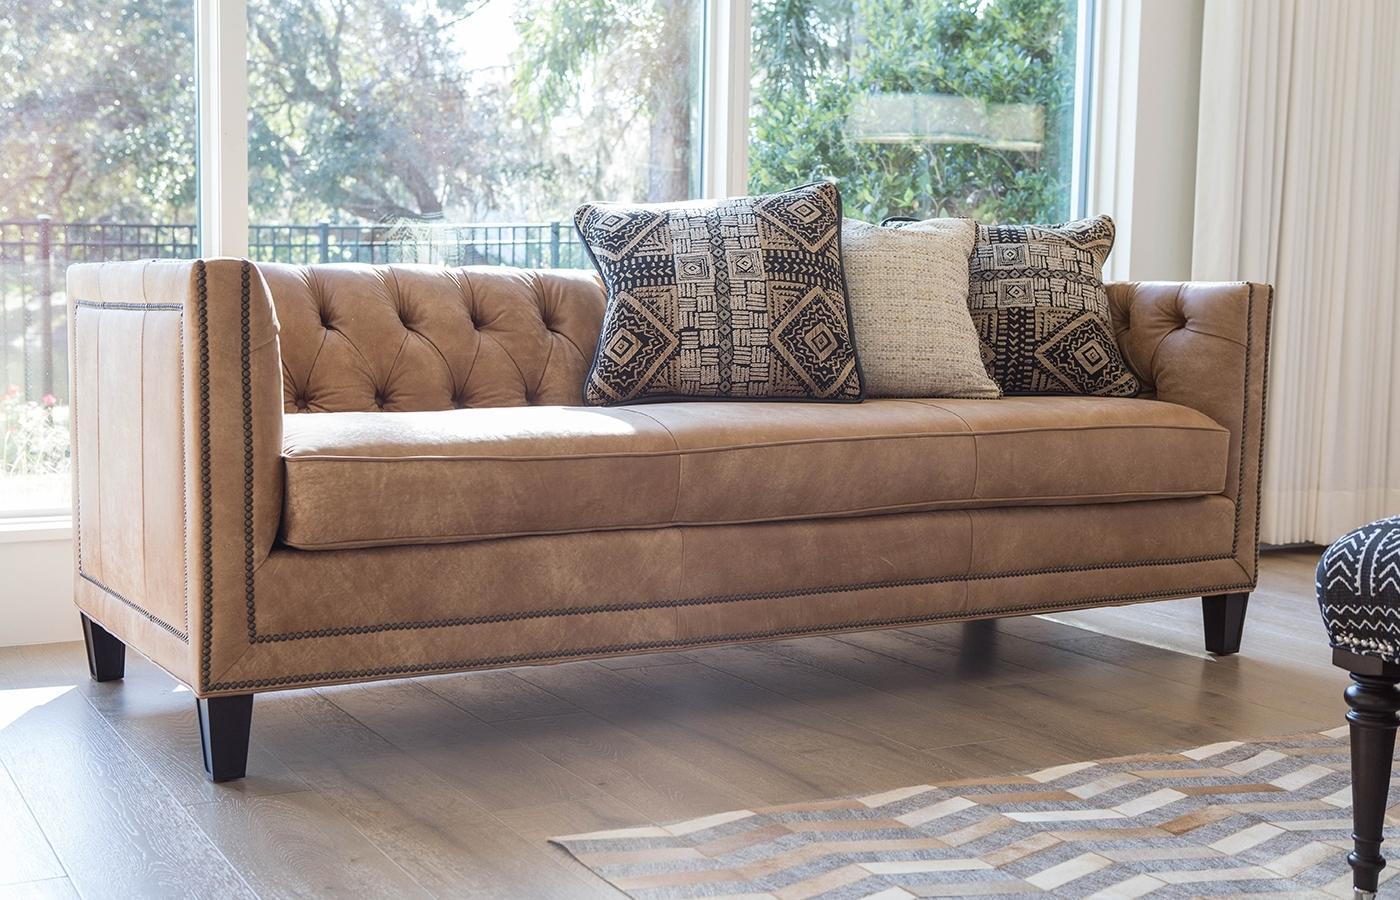 Norwalk Sofas Inside Fashionable Norwalk Furniture (View 12 of 15)